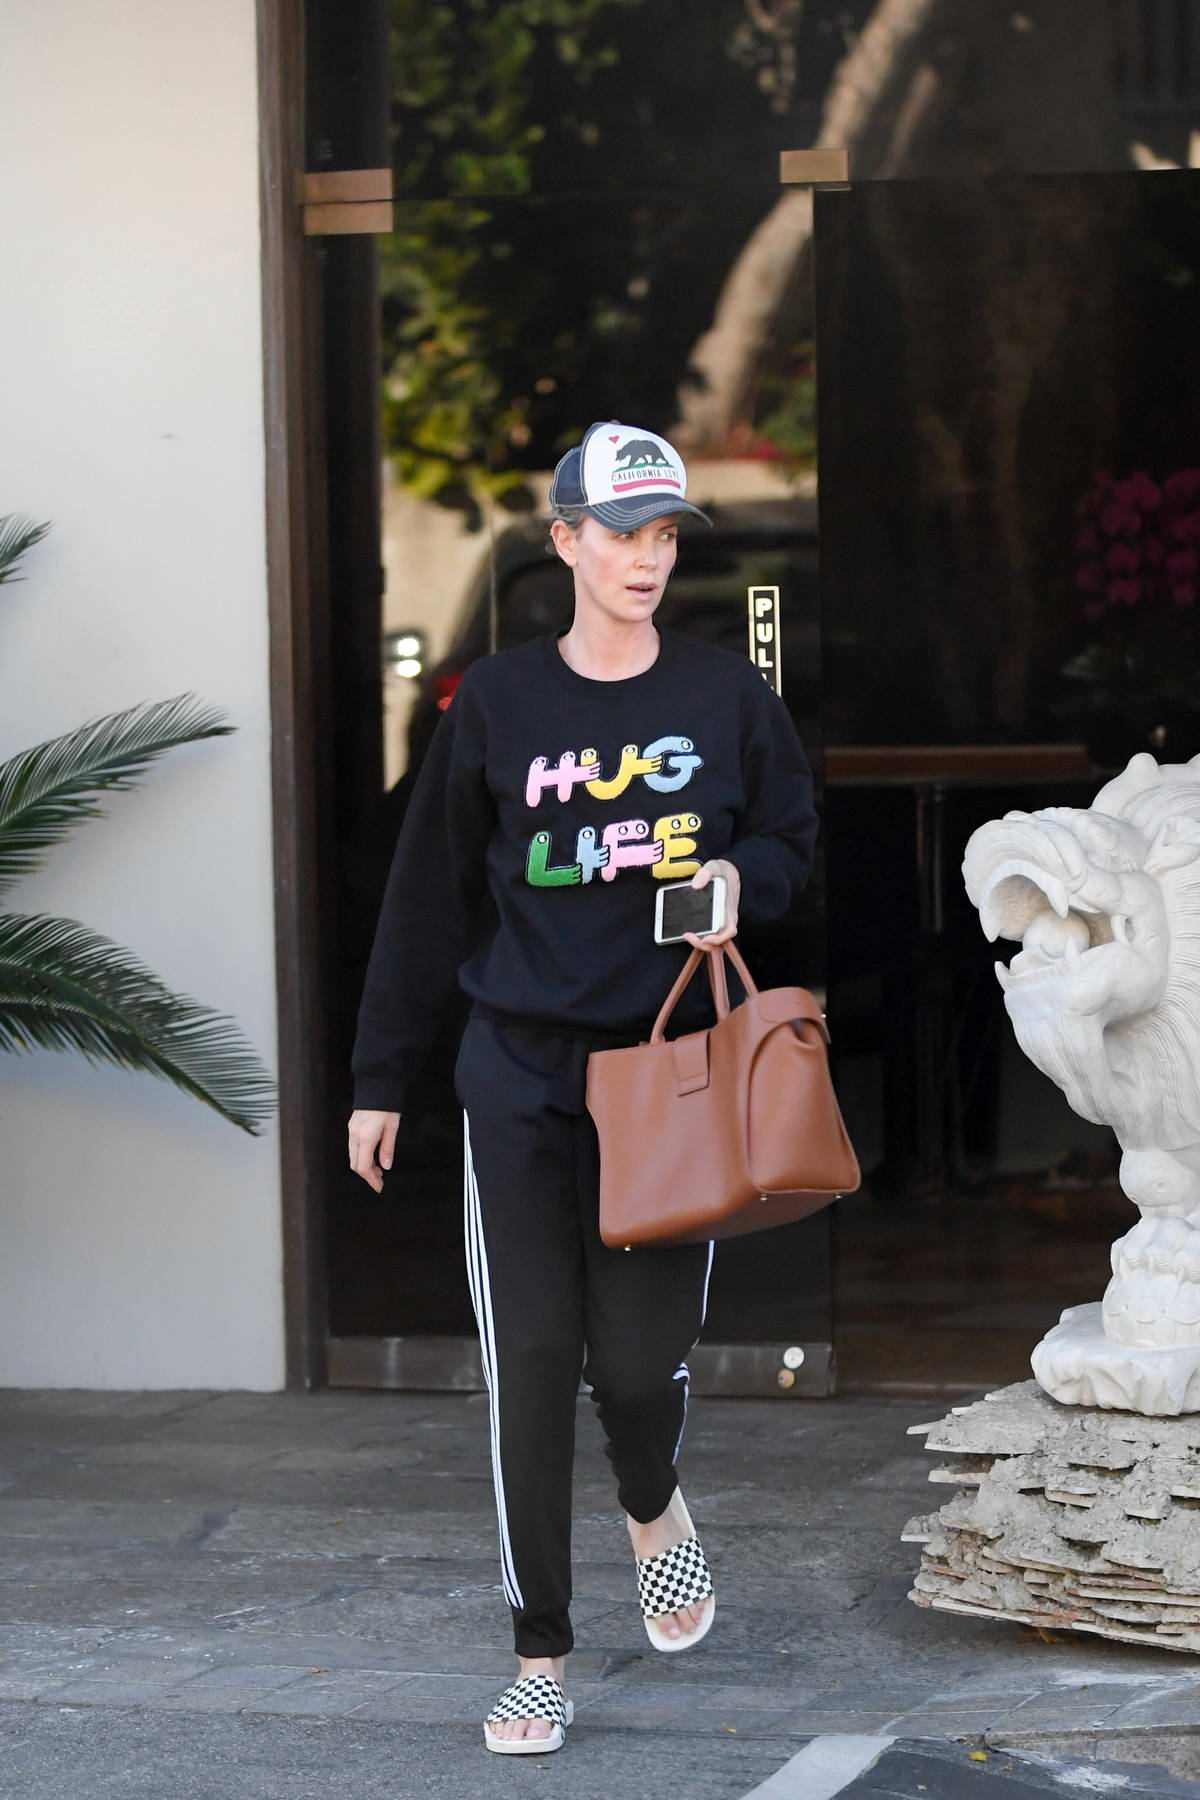 Charlize Theron sports a hug life sweatshirt as she leaves a Korean spa in Koreatown, Los Angeles